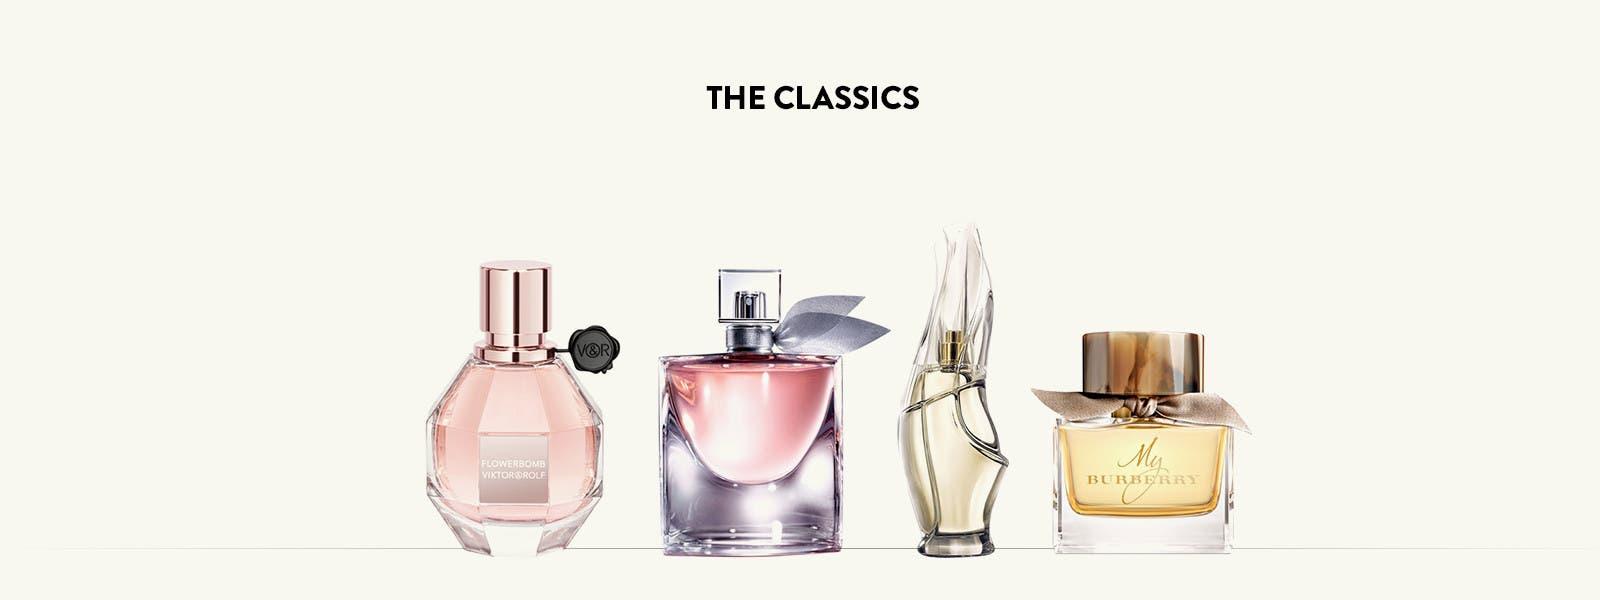 The classics.